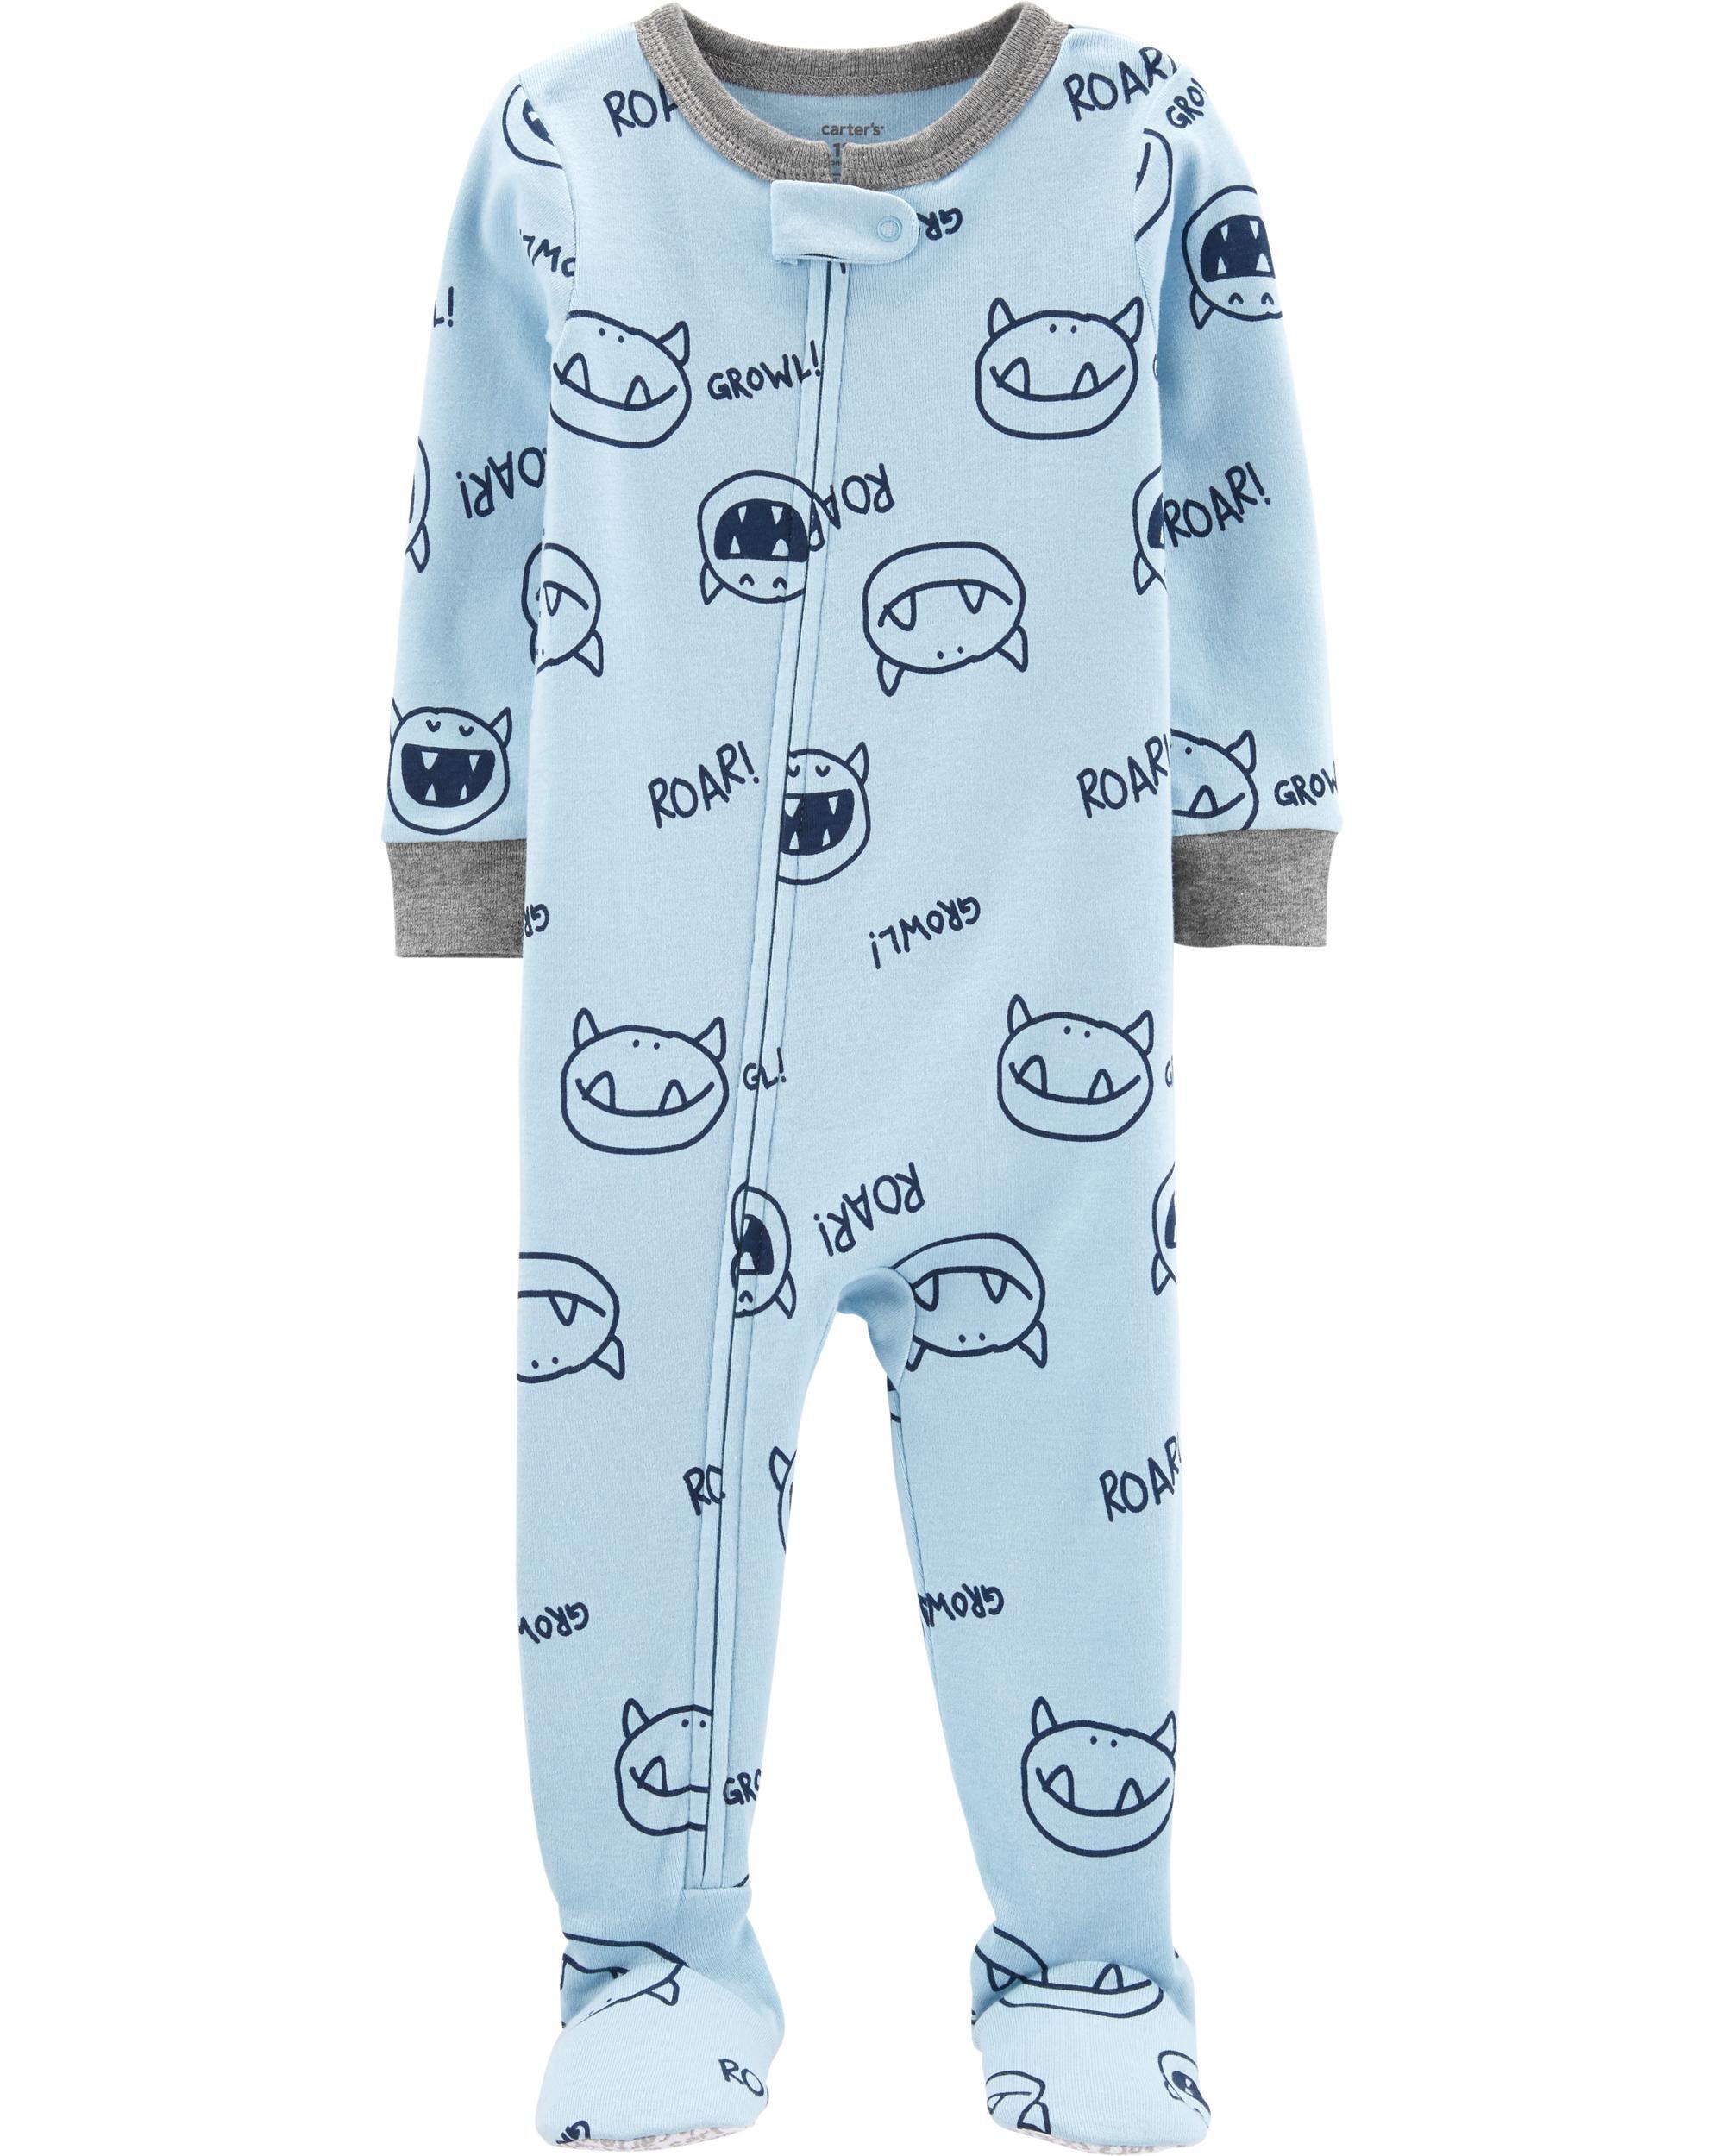 1-Piece Monster Cotton Footie PJs